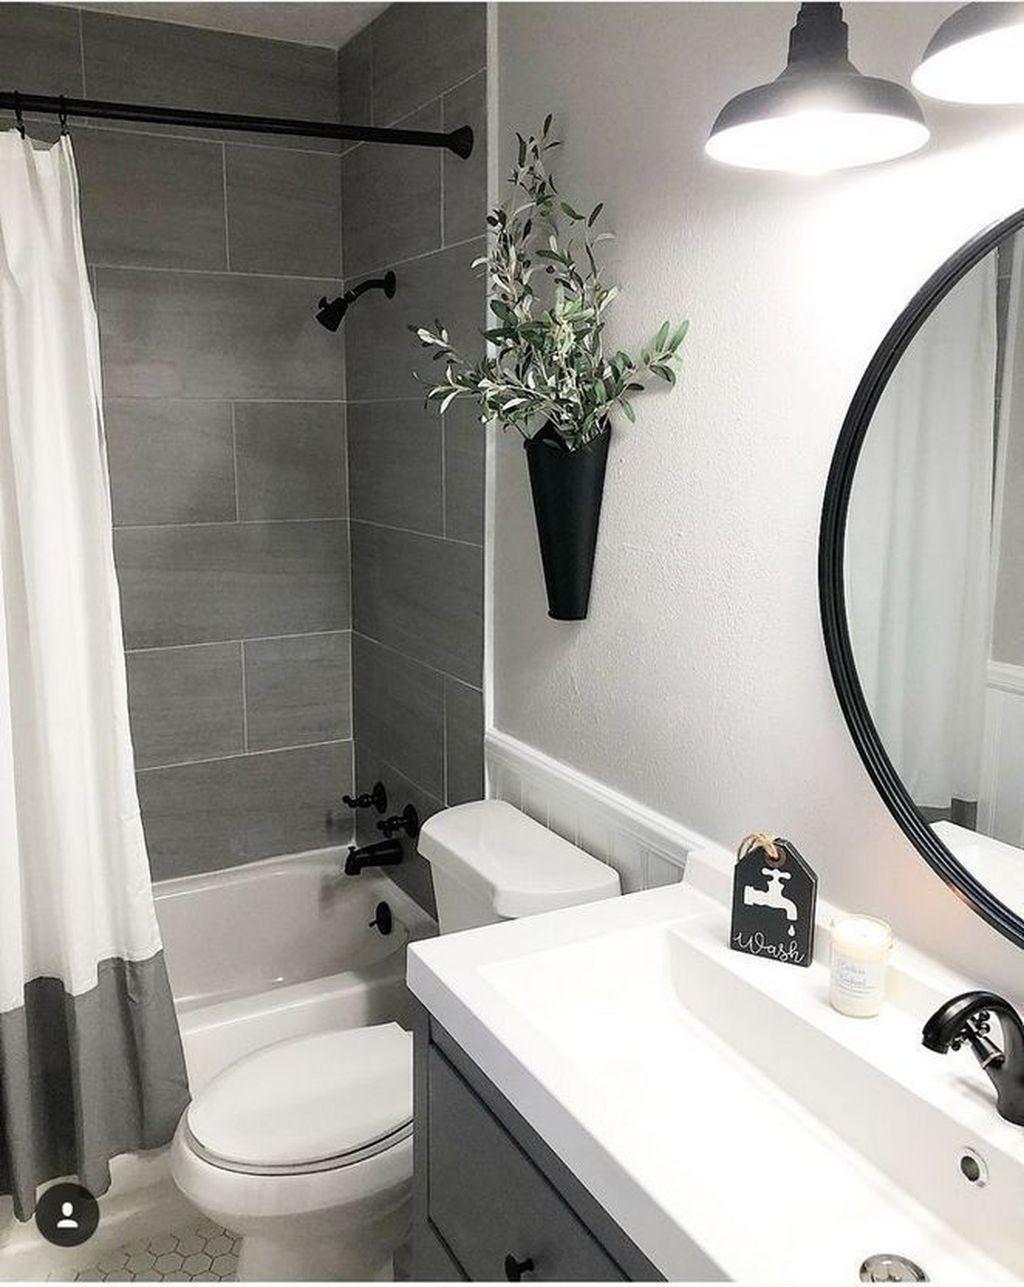 40 Amazing Small Bathroom Design Ideas In Apartment Apartment Bathroom Design Bathroom Design Small Small Bathroom Interior